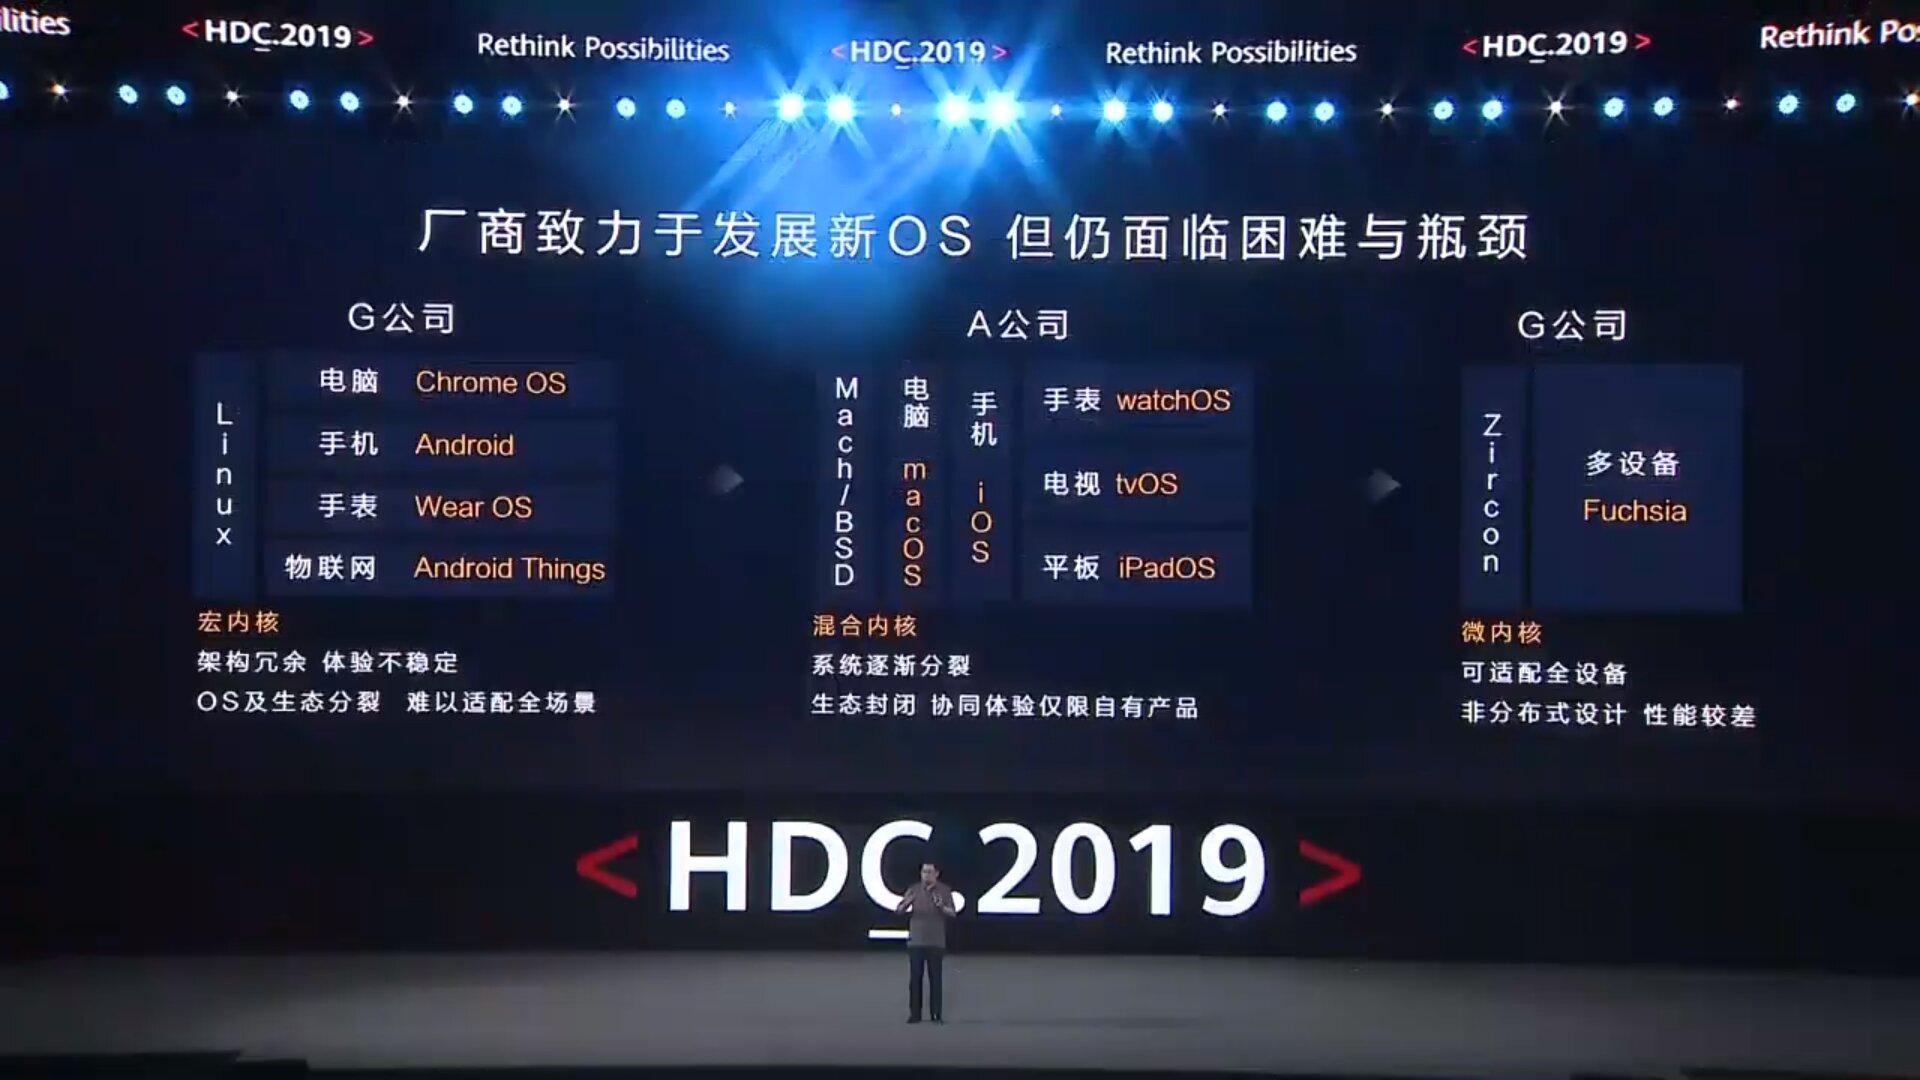 Aktuelle Fragmentierung laut Huawei